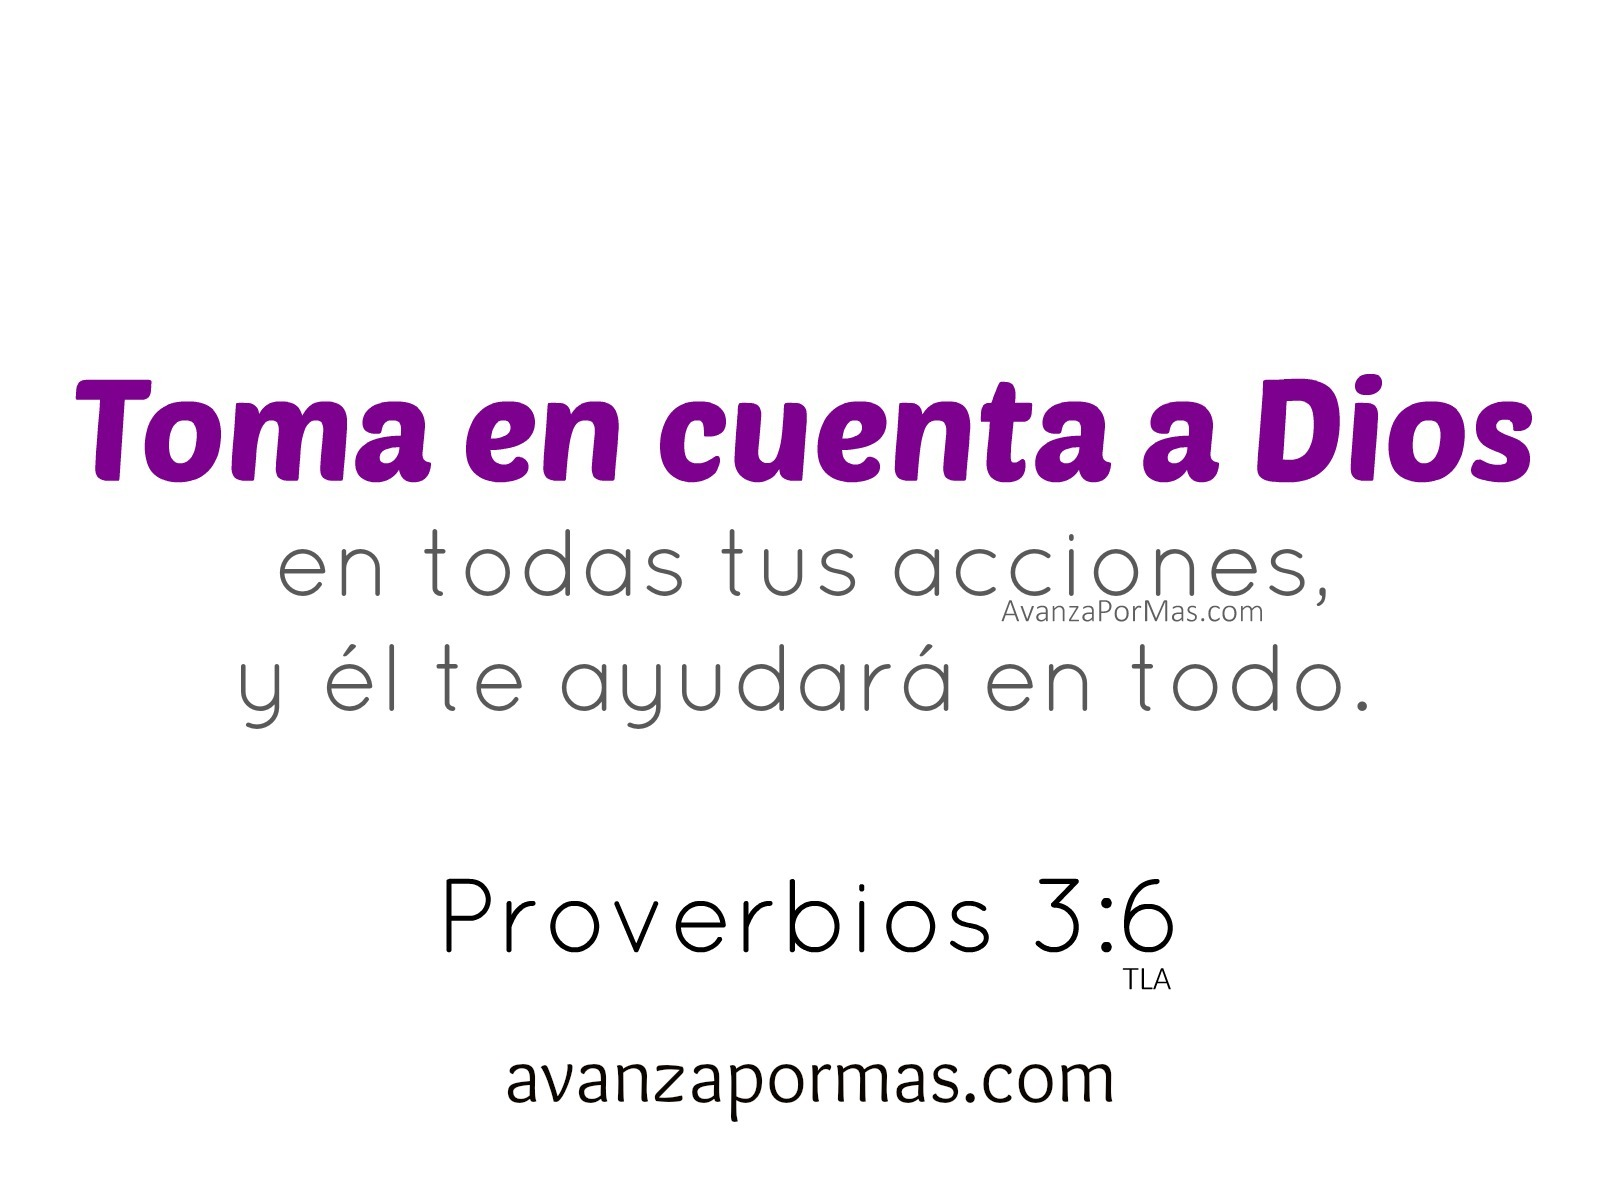 proverbios 4